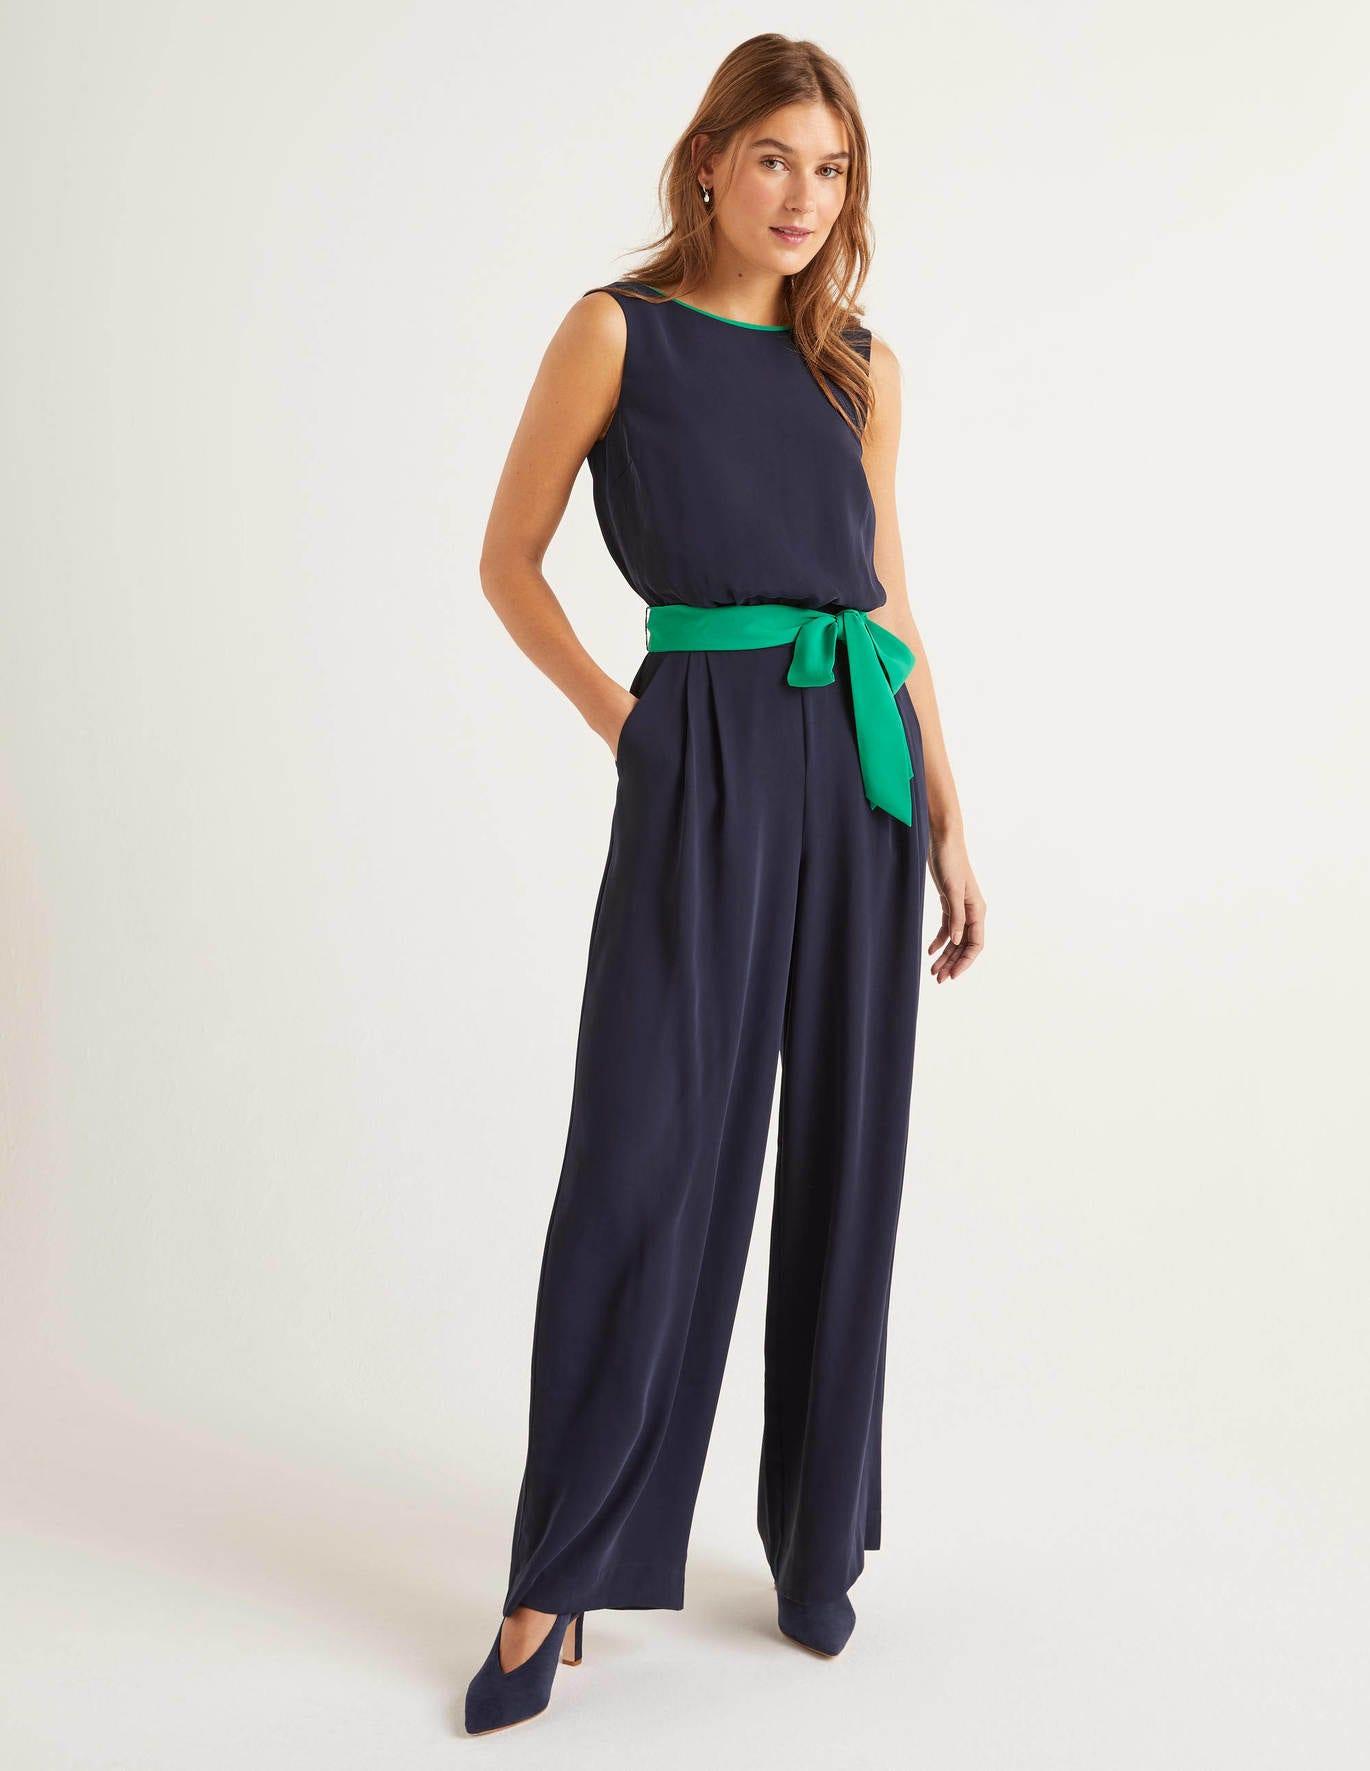 Lottie Jumpsuit - Navy/Green